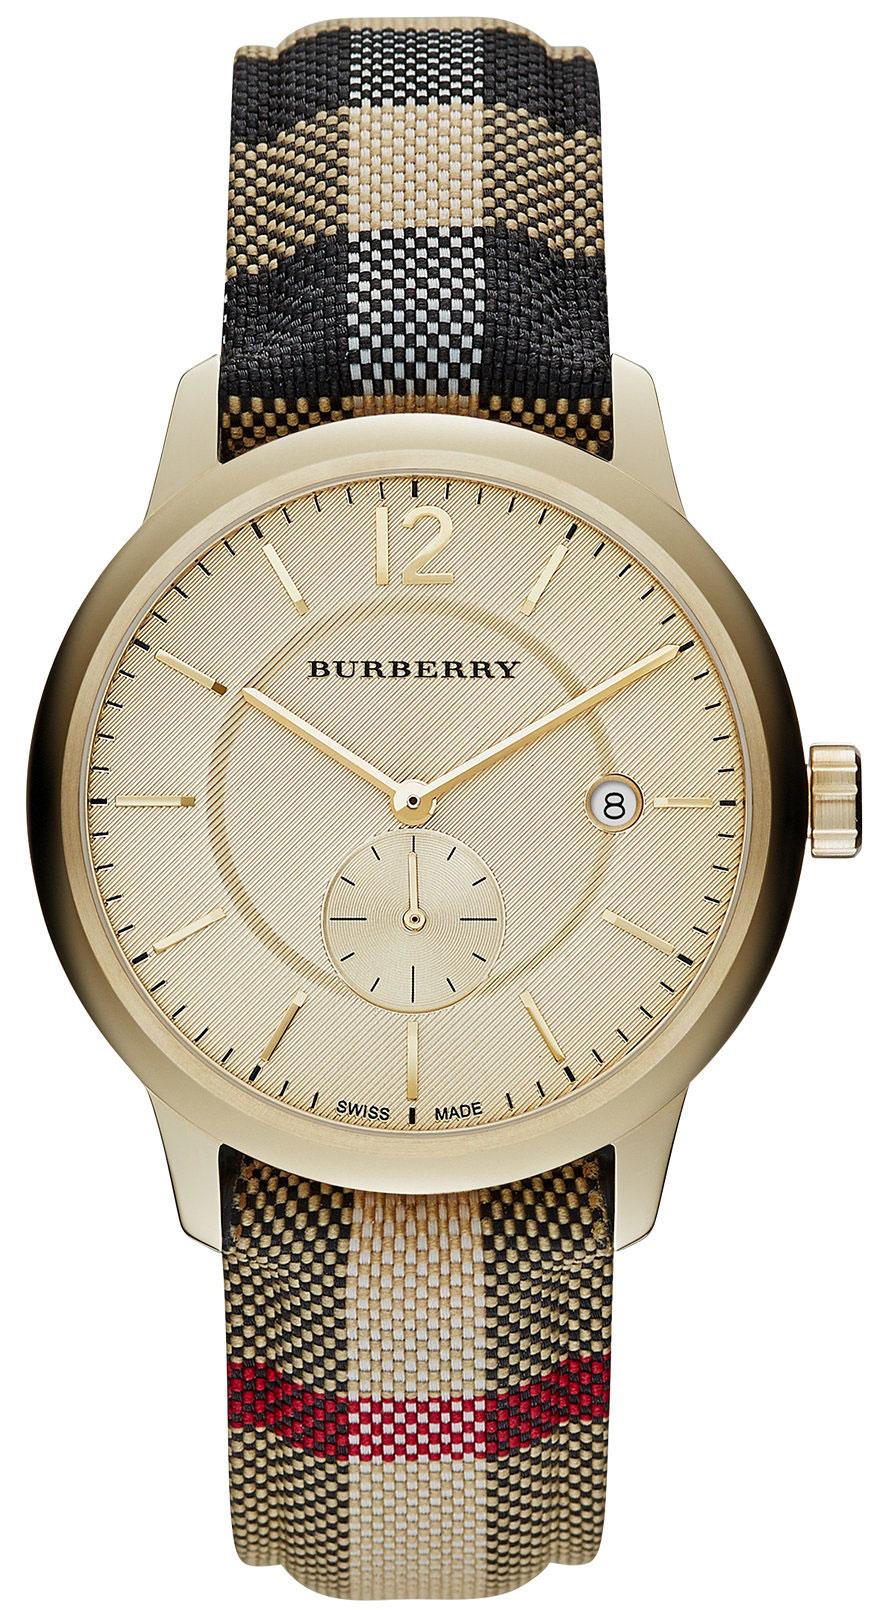 Burberry-Honey-Dial-Honey-Check-Fabric-Coated-Leather-Unisex-BU10001